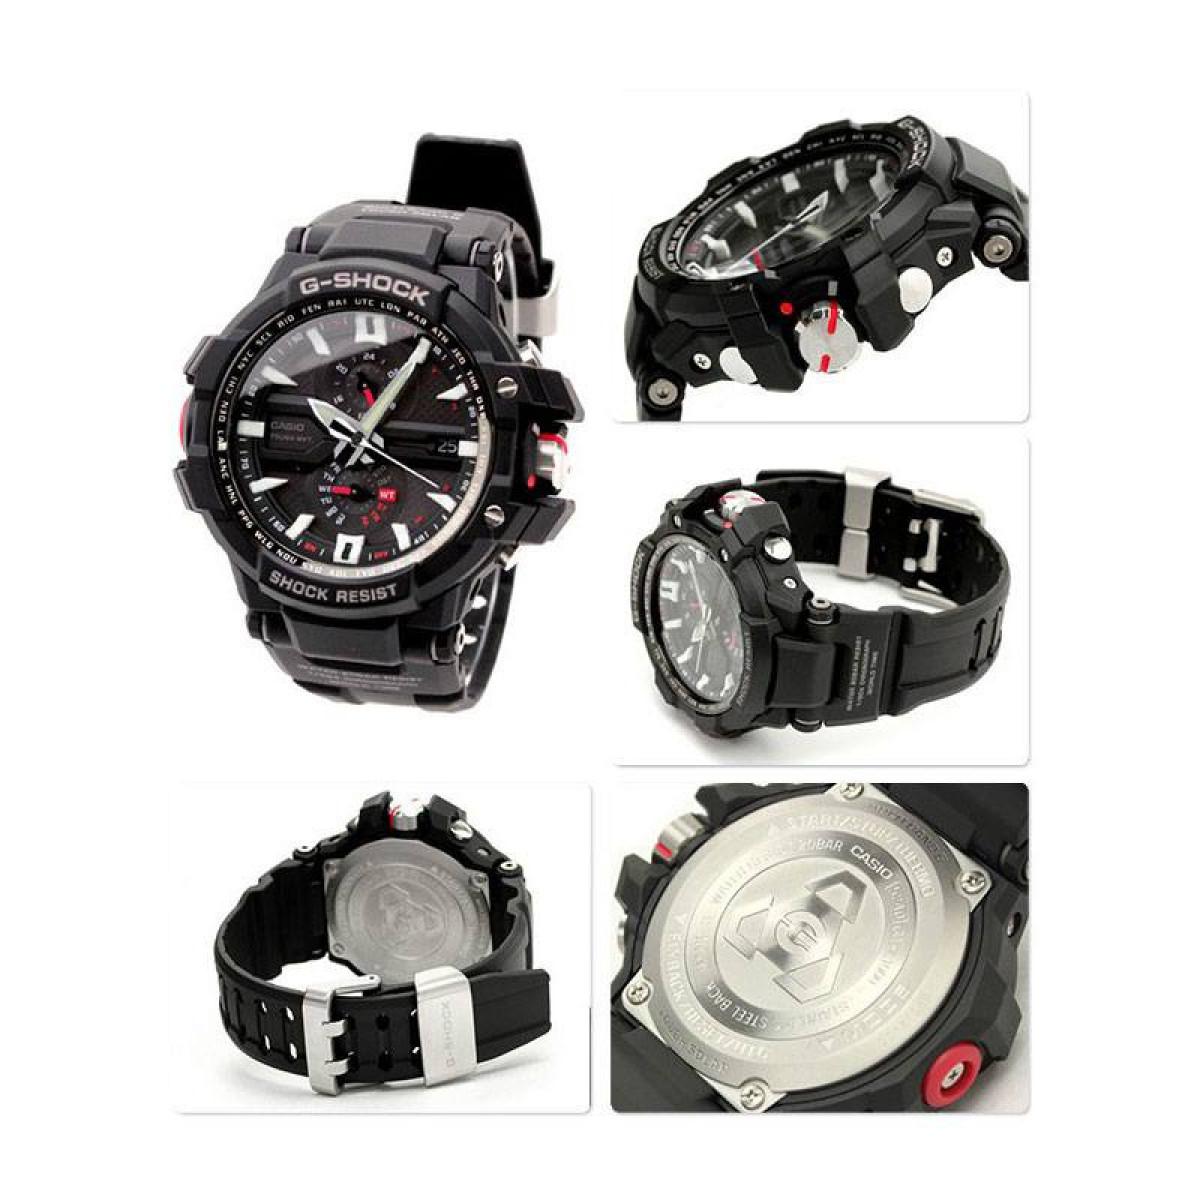 Часовник Casio G-Shock Gravitymaster GW-A1000-1AER